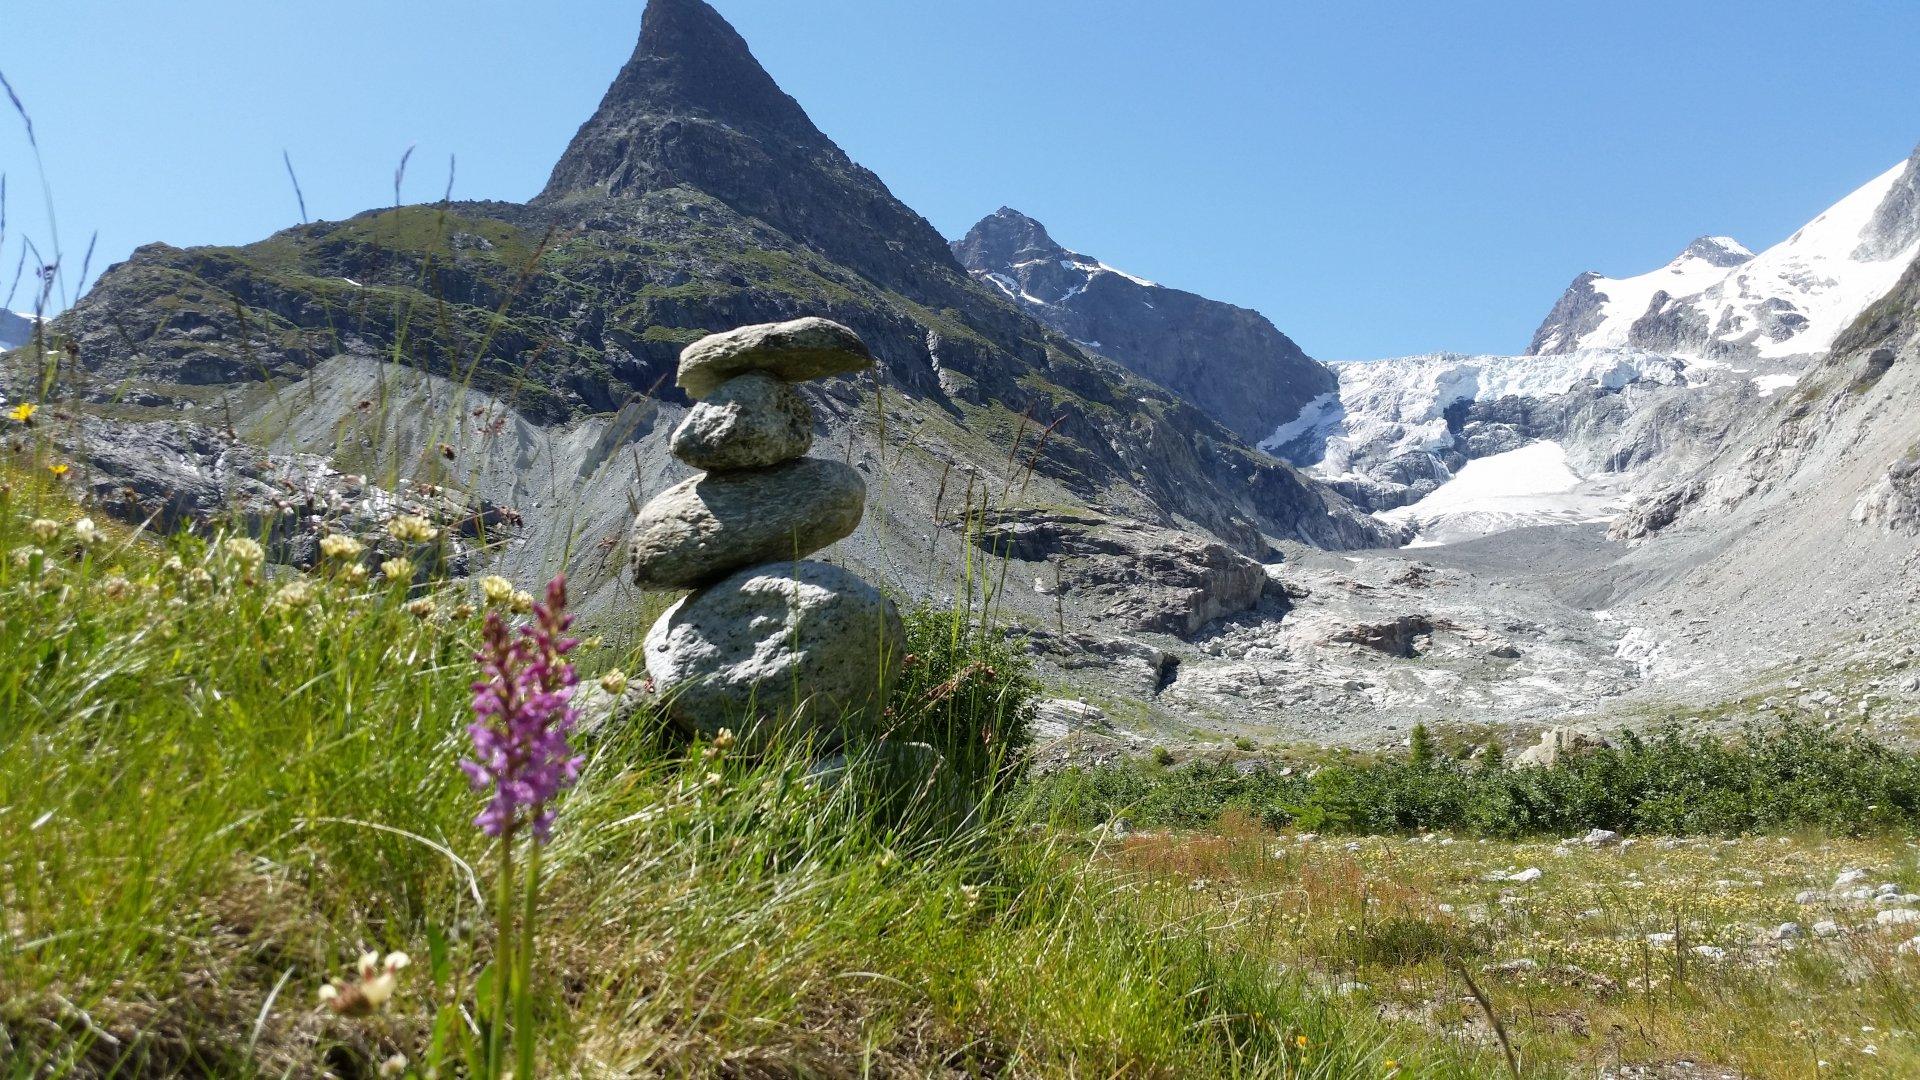 Vallon de Ferpècle: Gletscher und Pflanzen